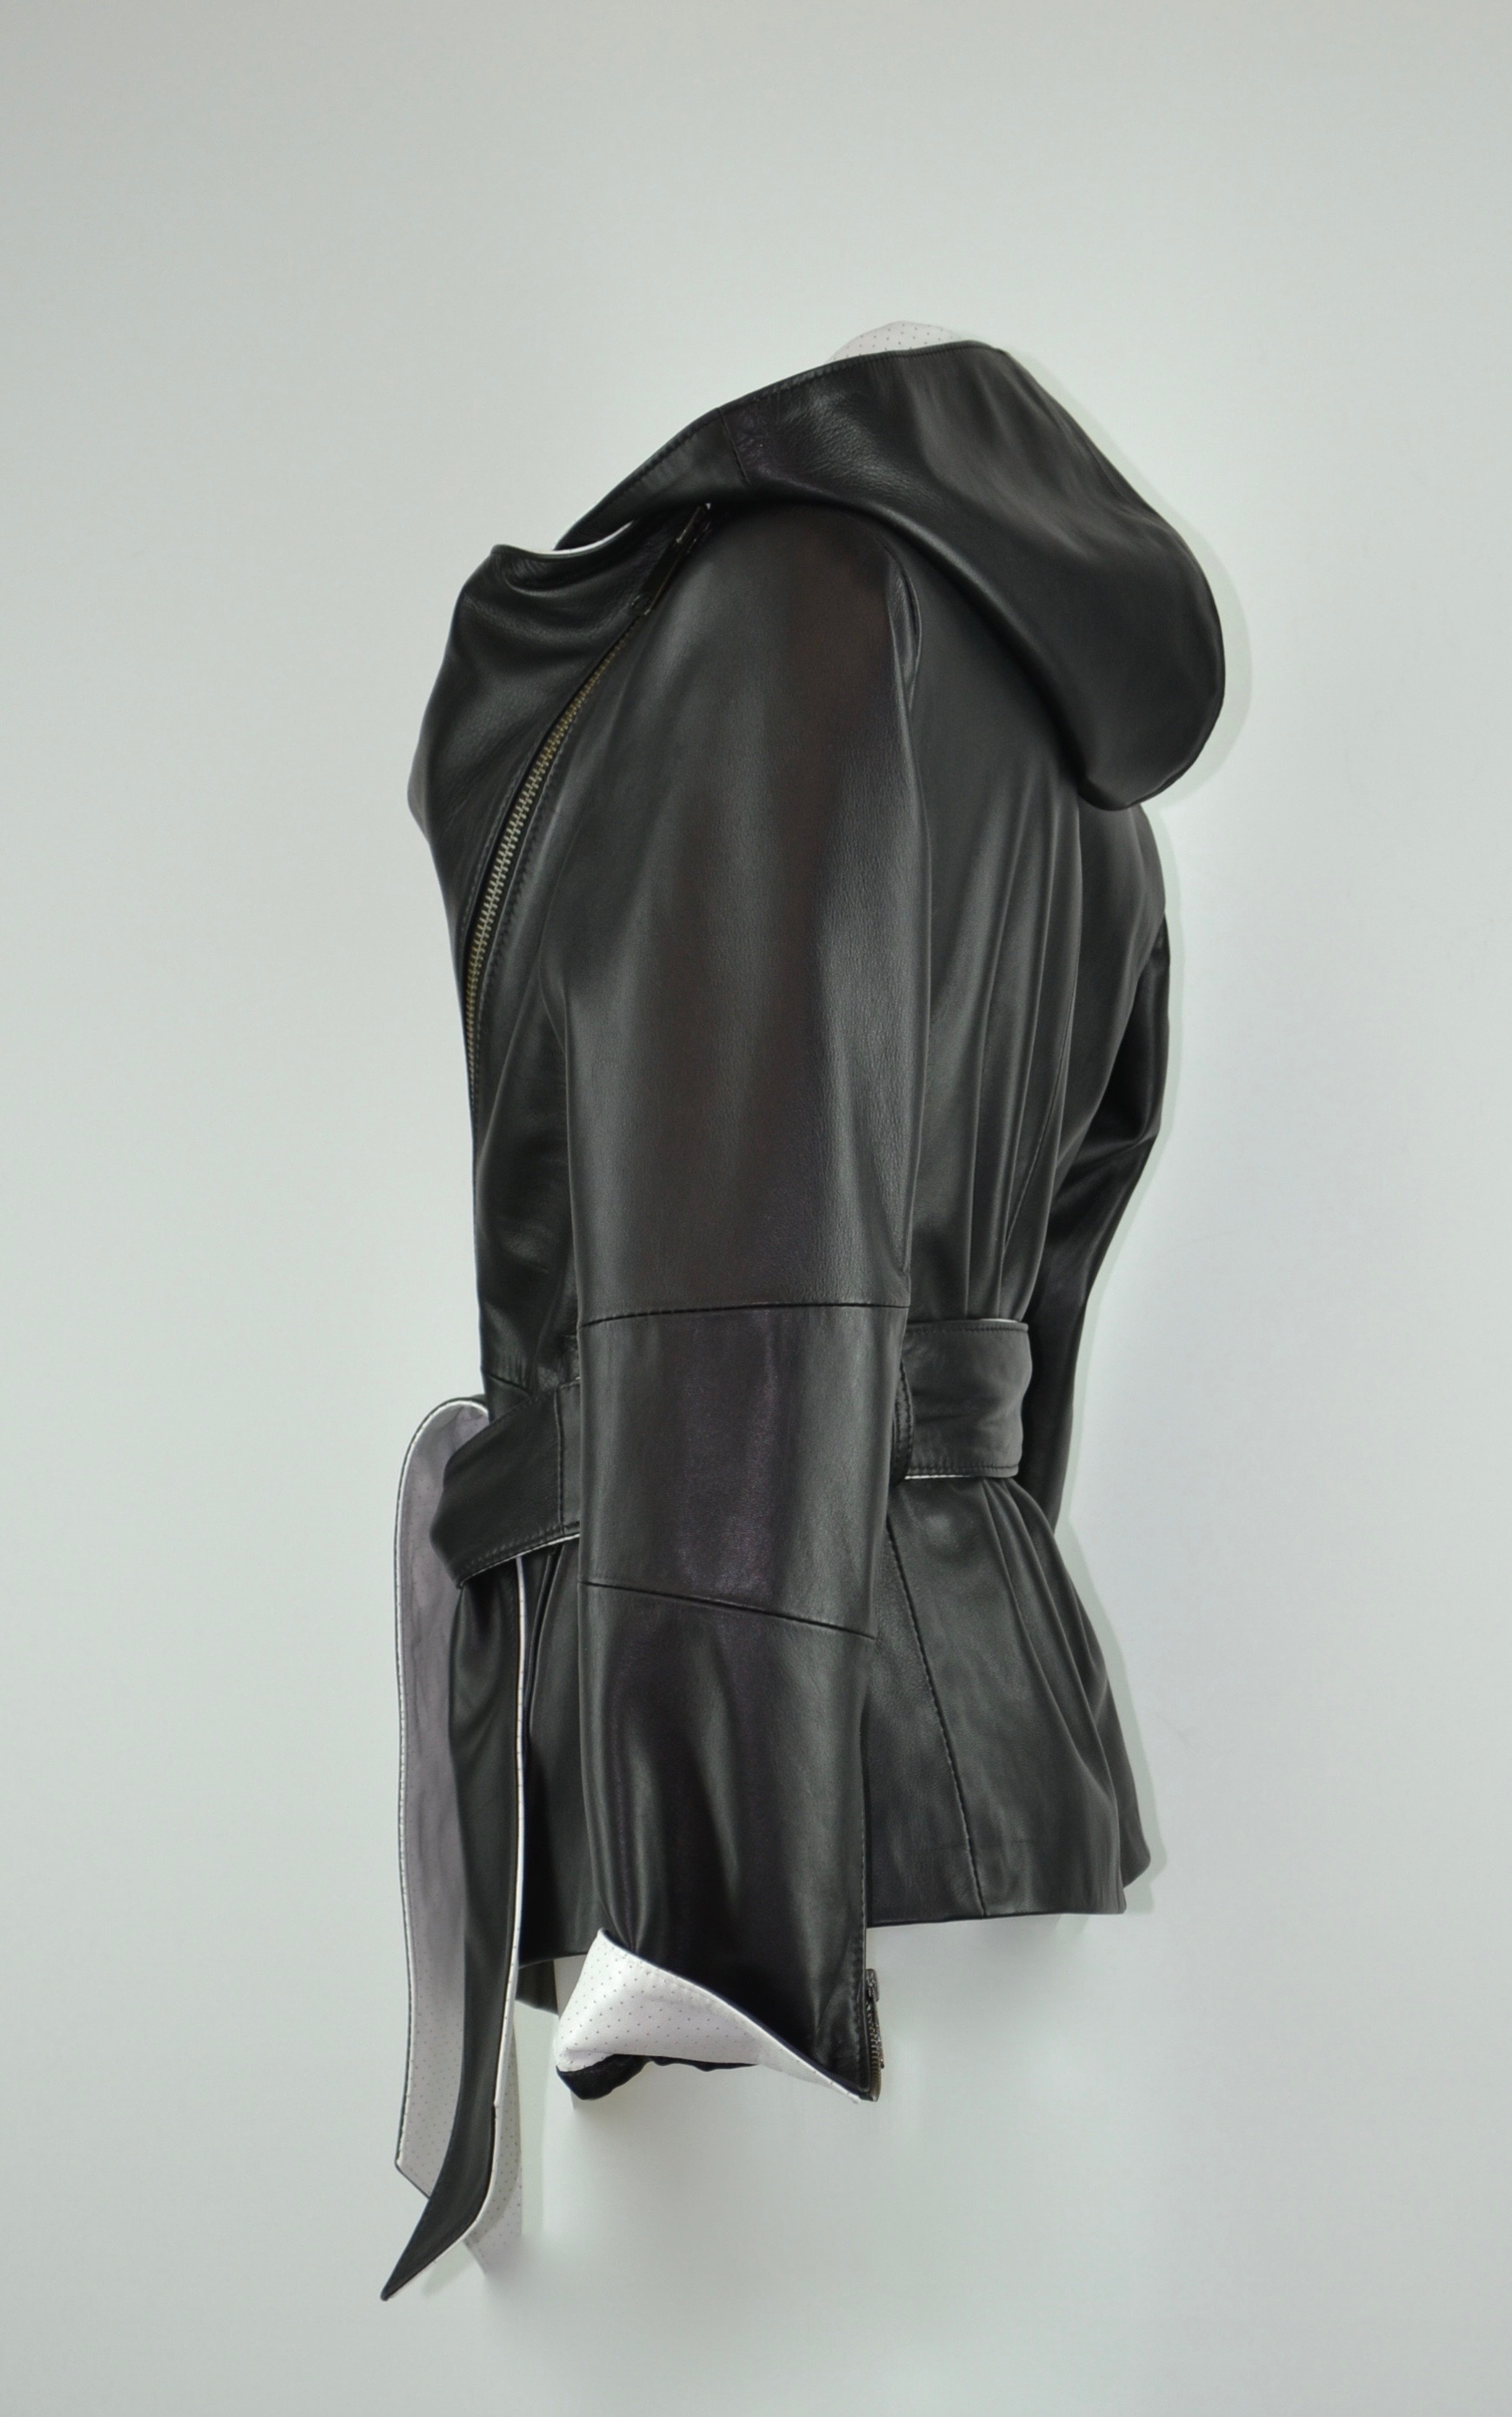 379c8bb50f 149 Γυναικείο δερμάτινο μπουφάν Κωδ 149 - Δερμάτινα Σαββίδης Θεσσαλονίκη